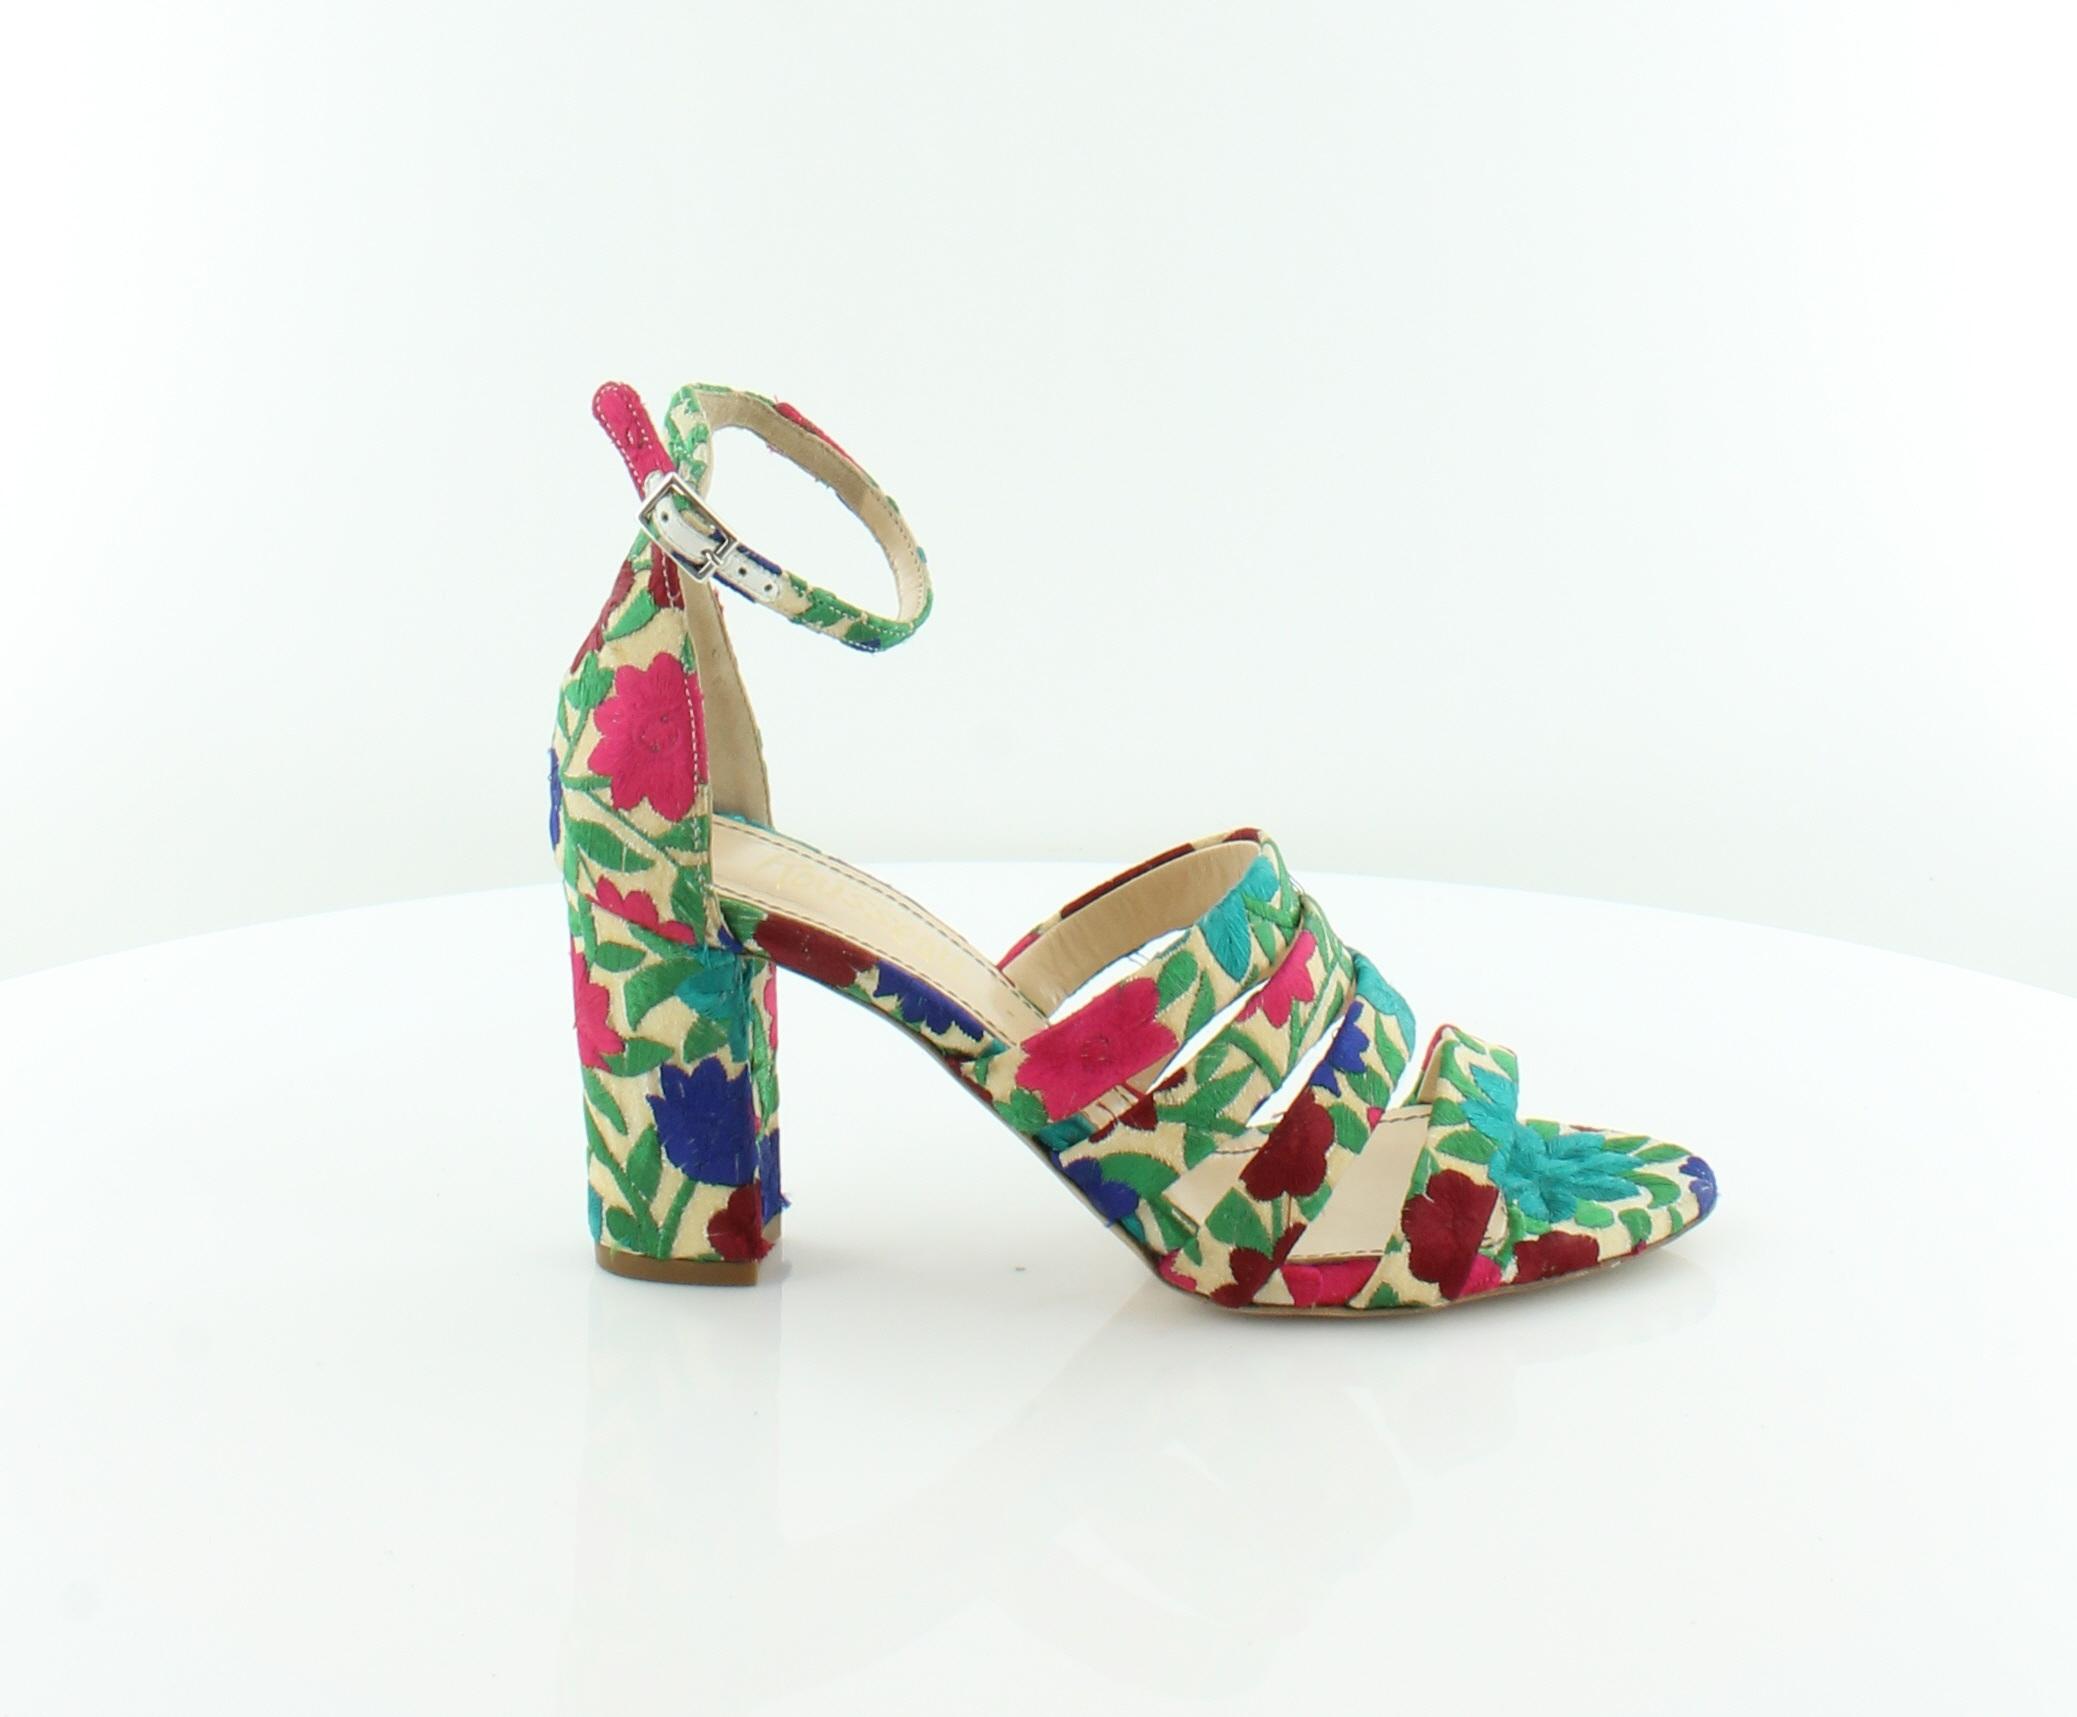 Jerome C. Rousseau Rousseau Rousseau Abelline verde Sandalias De Mujer Zapatos Talla 7 M MSRP  595  Venta al por mayor barato y de alta calidad.